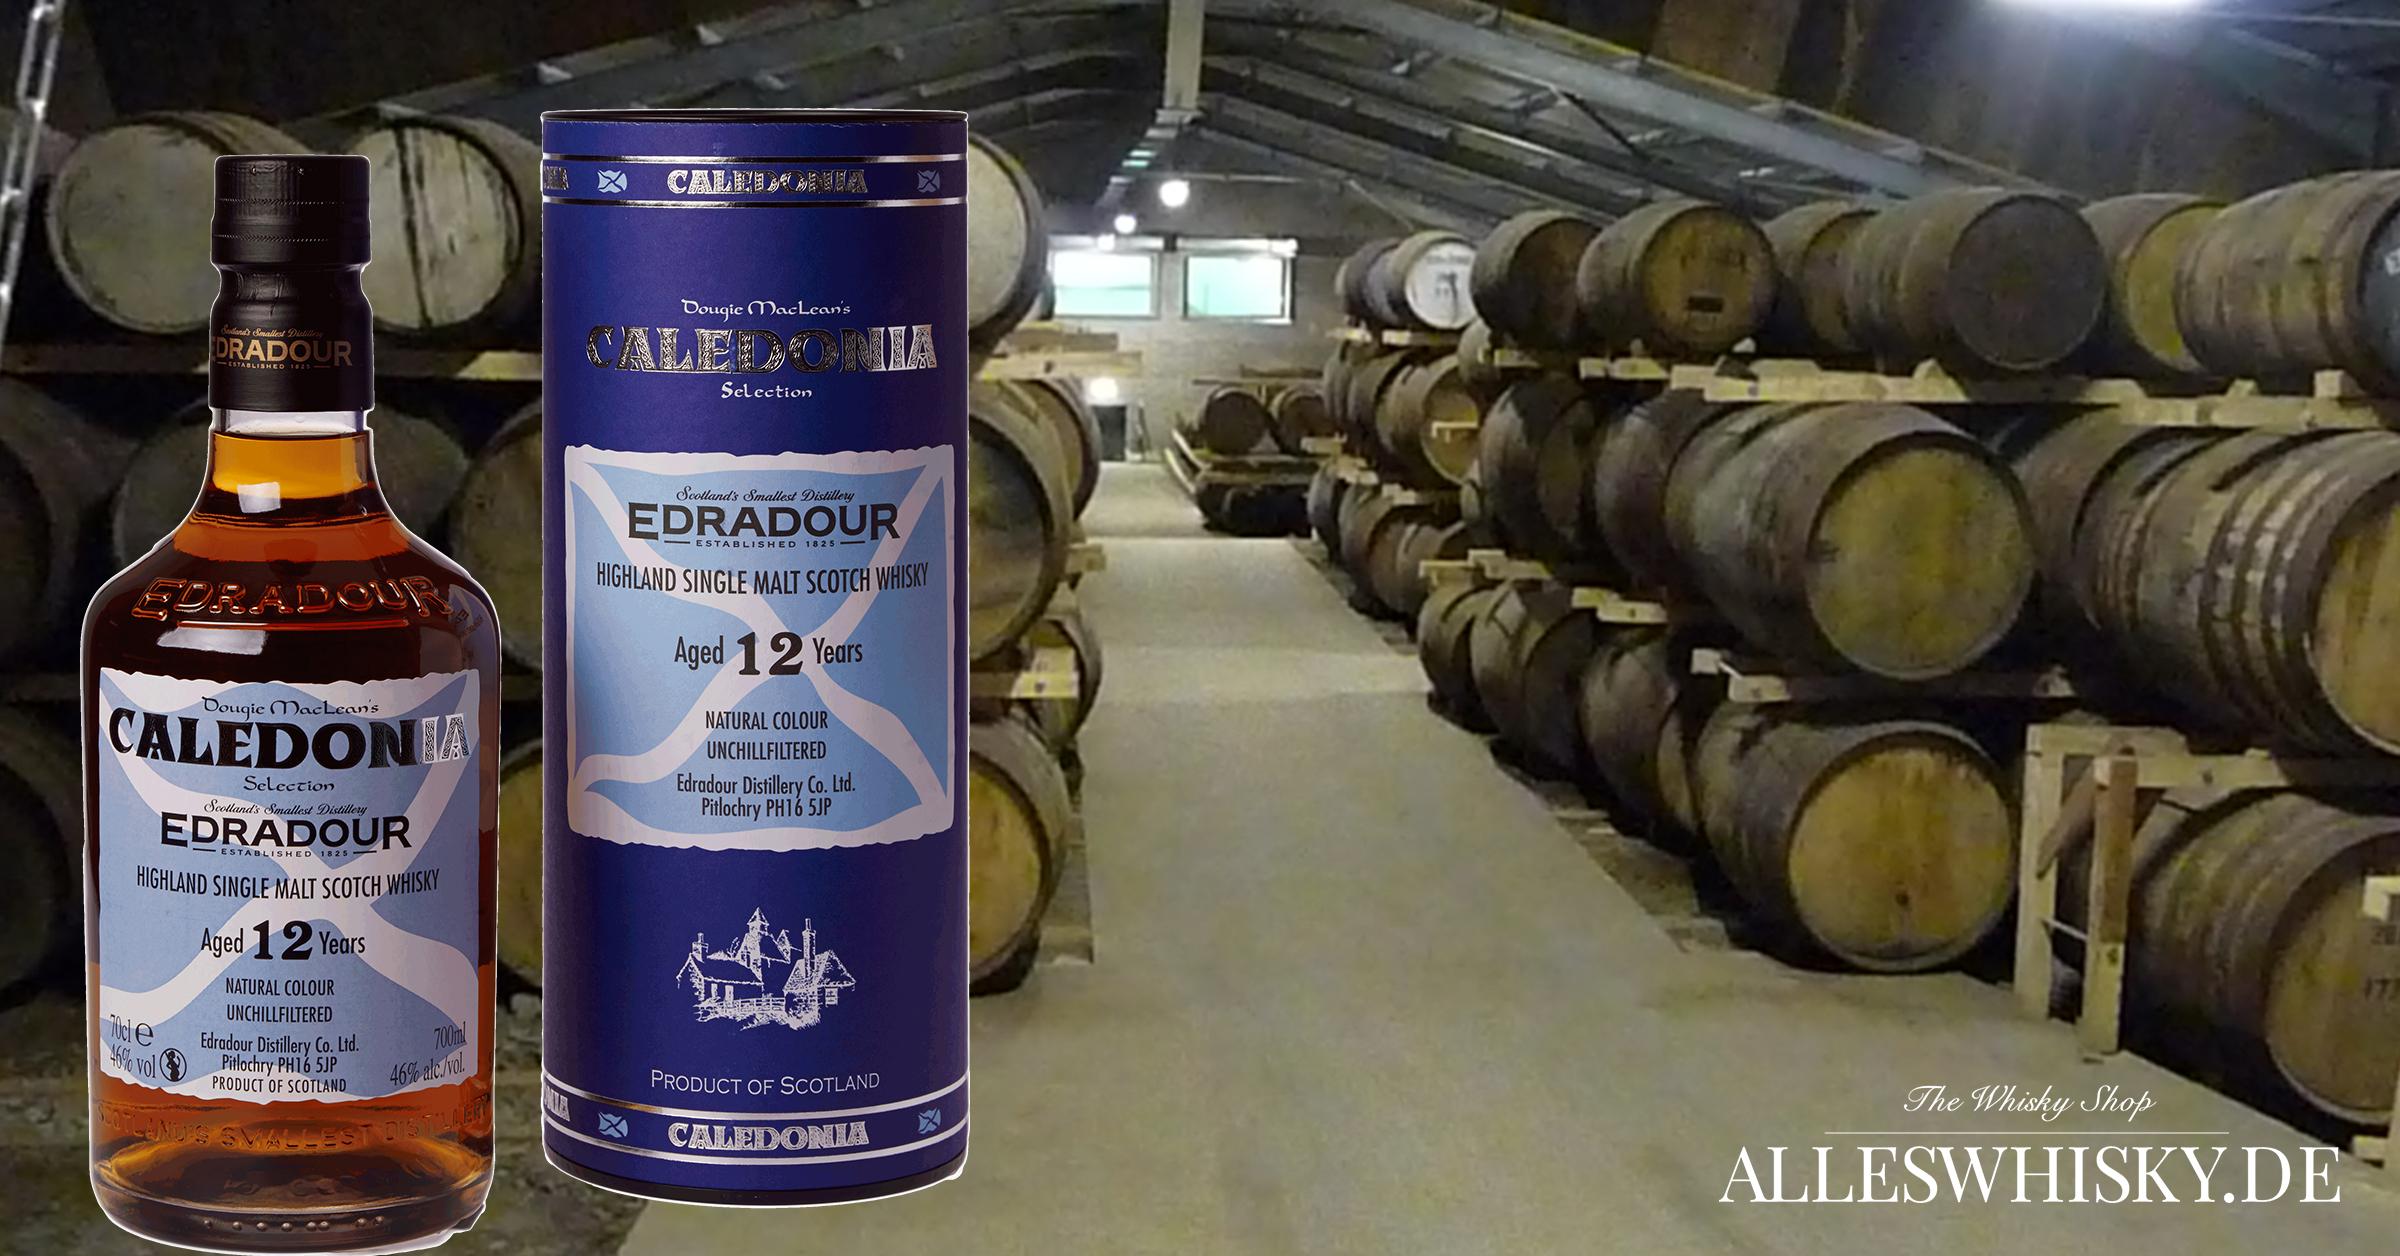 Edradour 12 Jahre Calendonia Whisky Brennerei Warehouse Oktober 2011